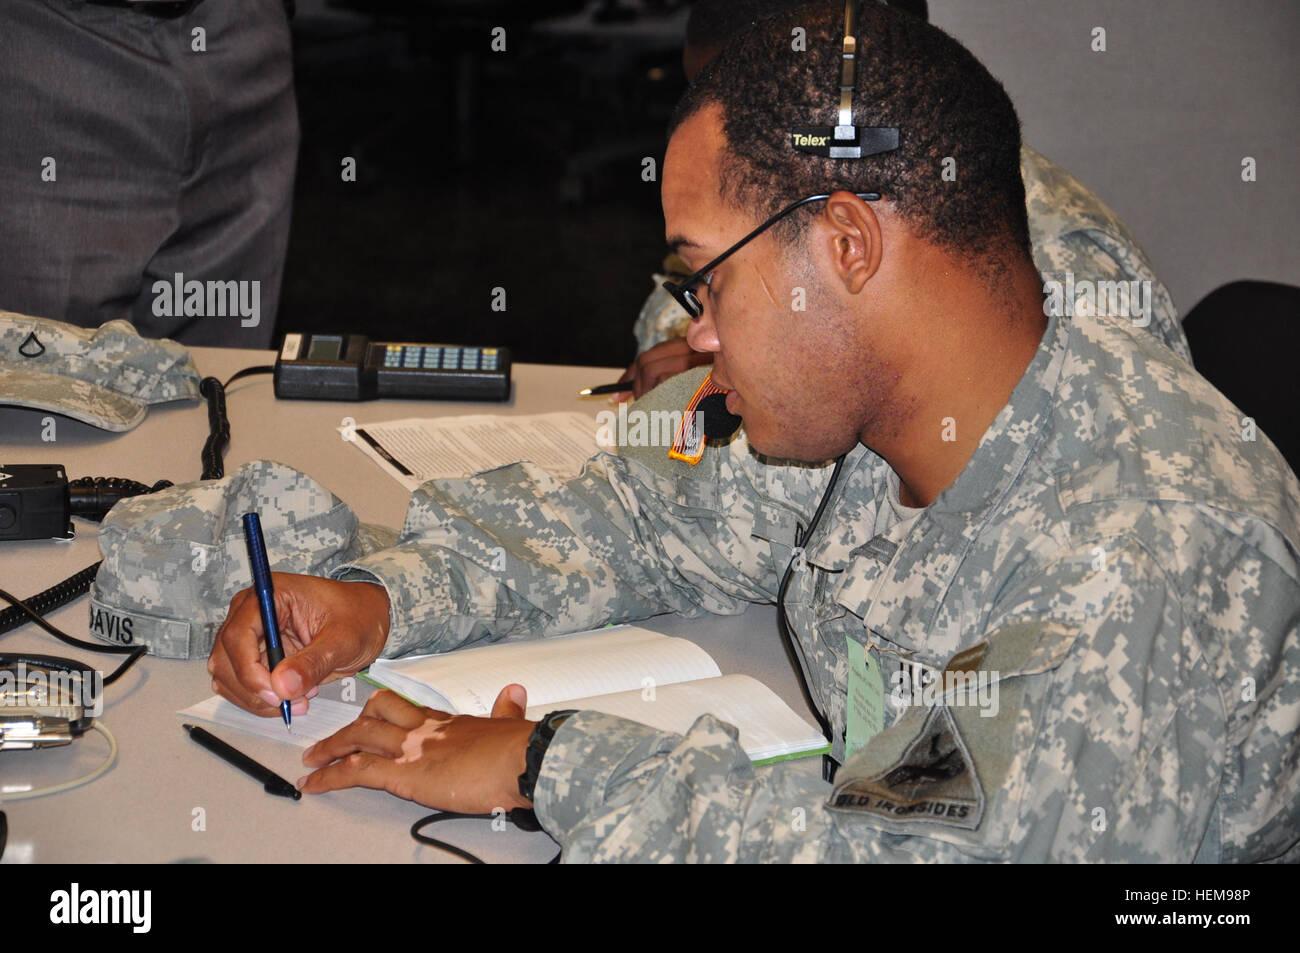 Pfc Walter Davis a Bradley fighting vehicle system maintainer